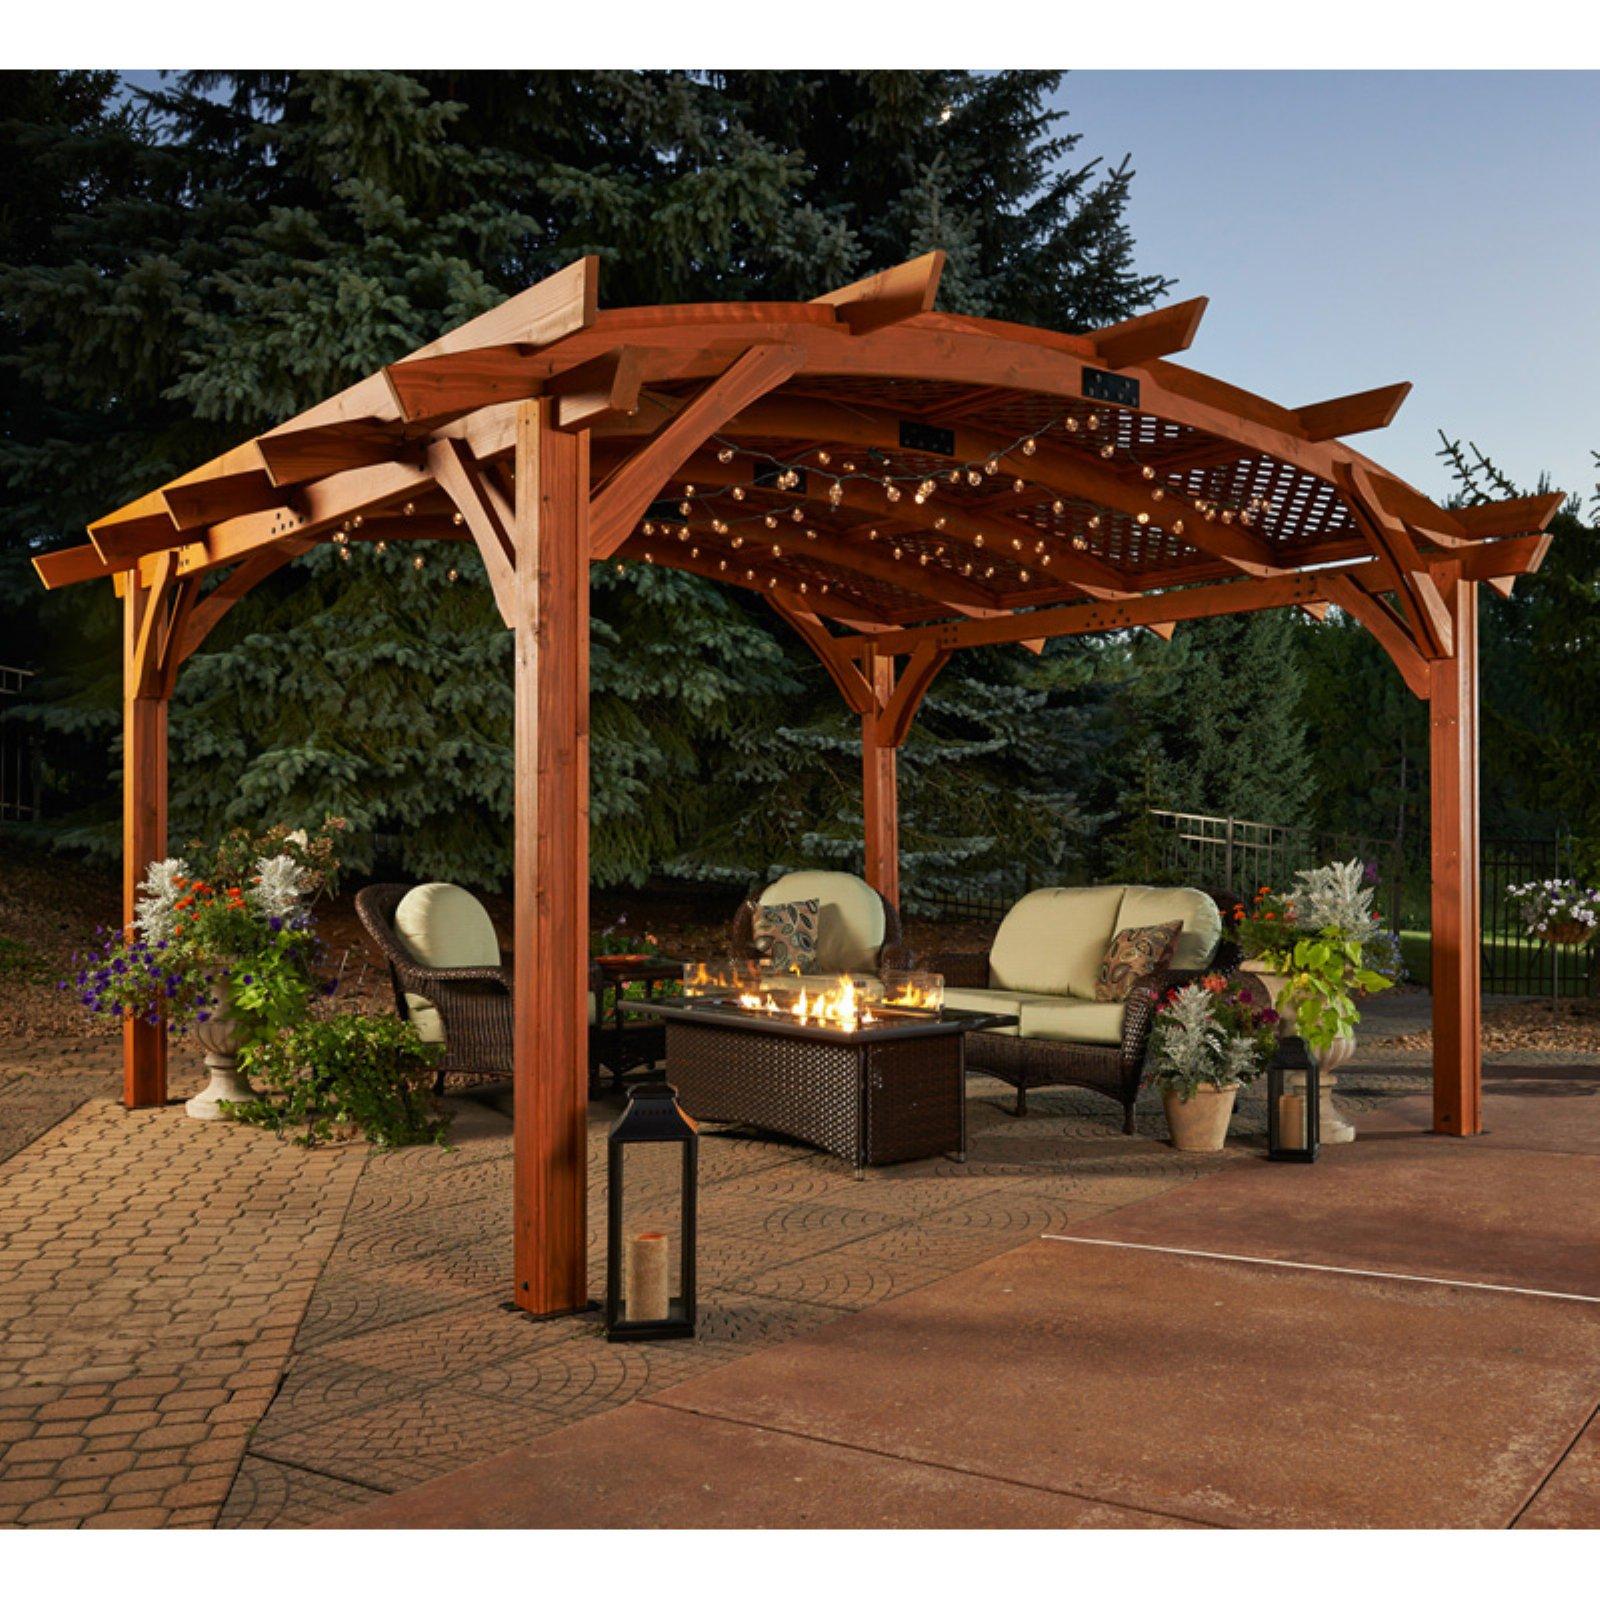 Sonoma 12 x 16 ft. Arched Wood Pergola - Redwood